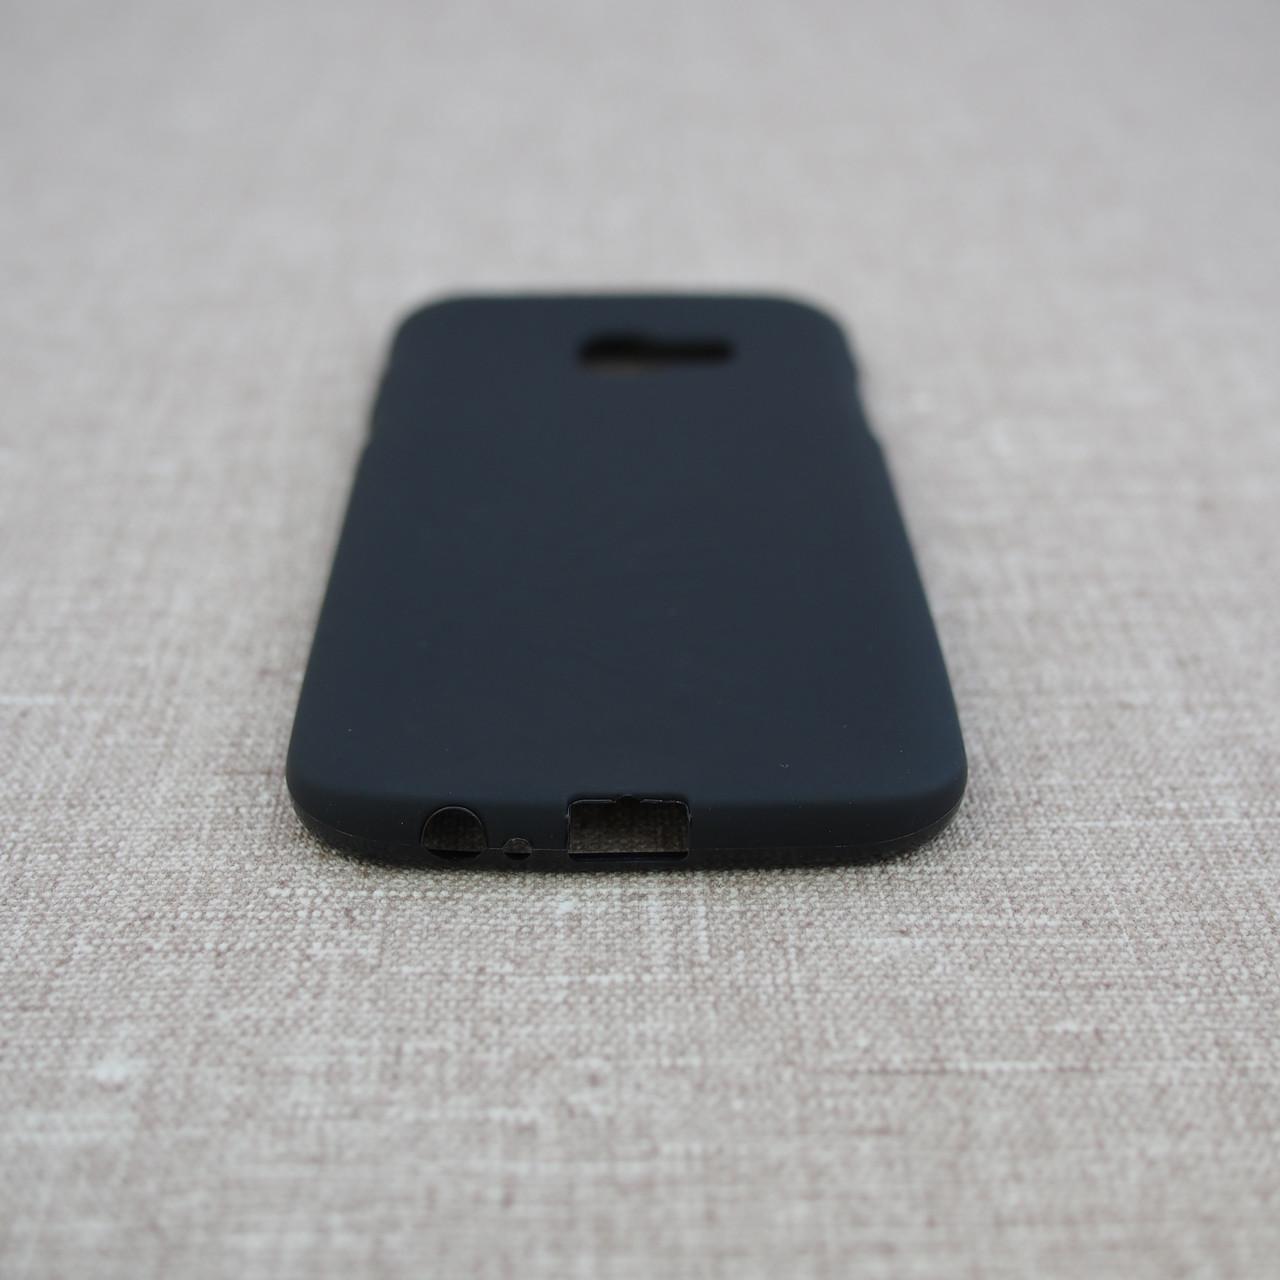 Чехол TPU Samsung A520 black Galaxy A5 (A520) 2017 Для телефона